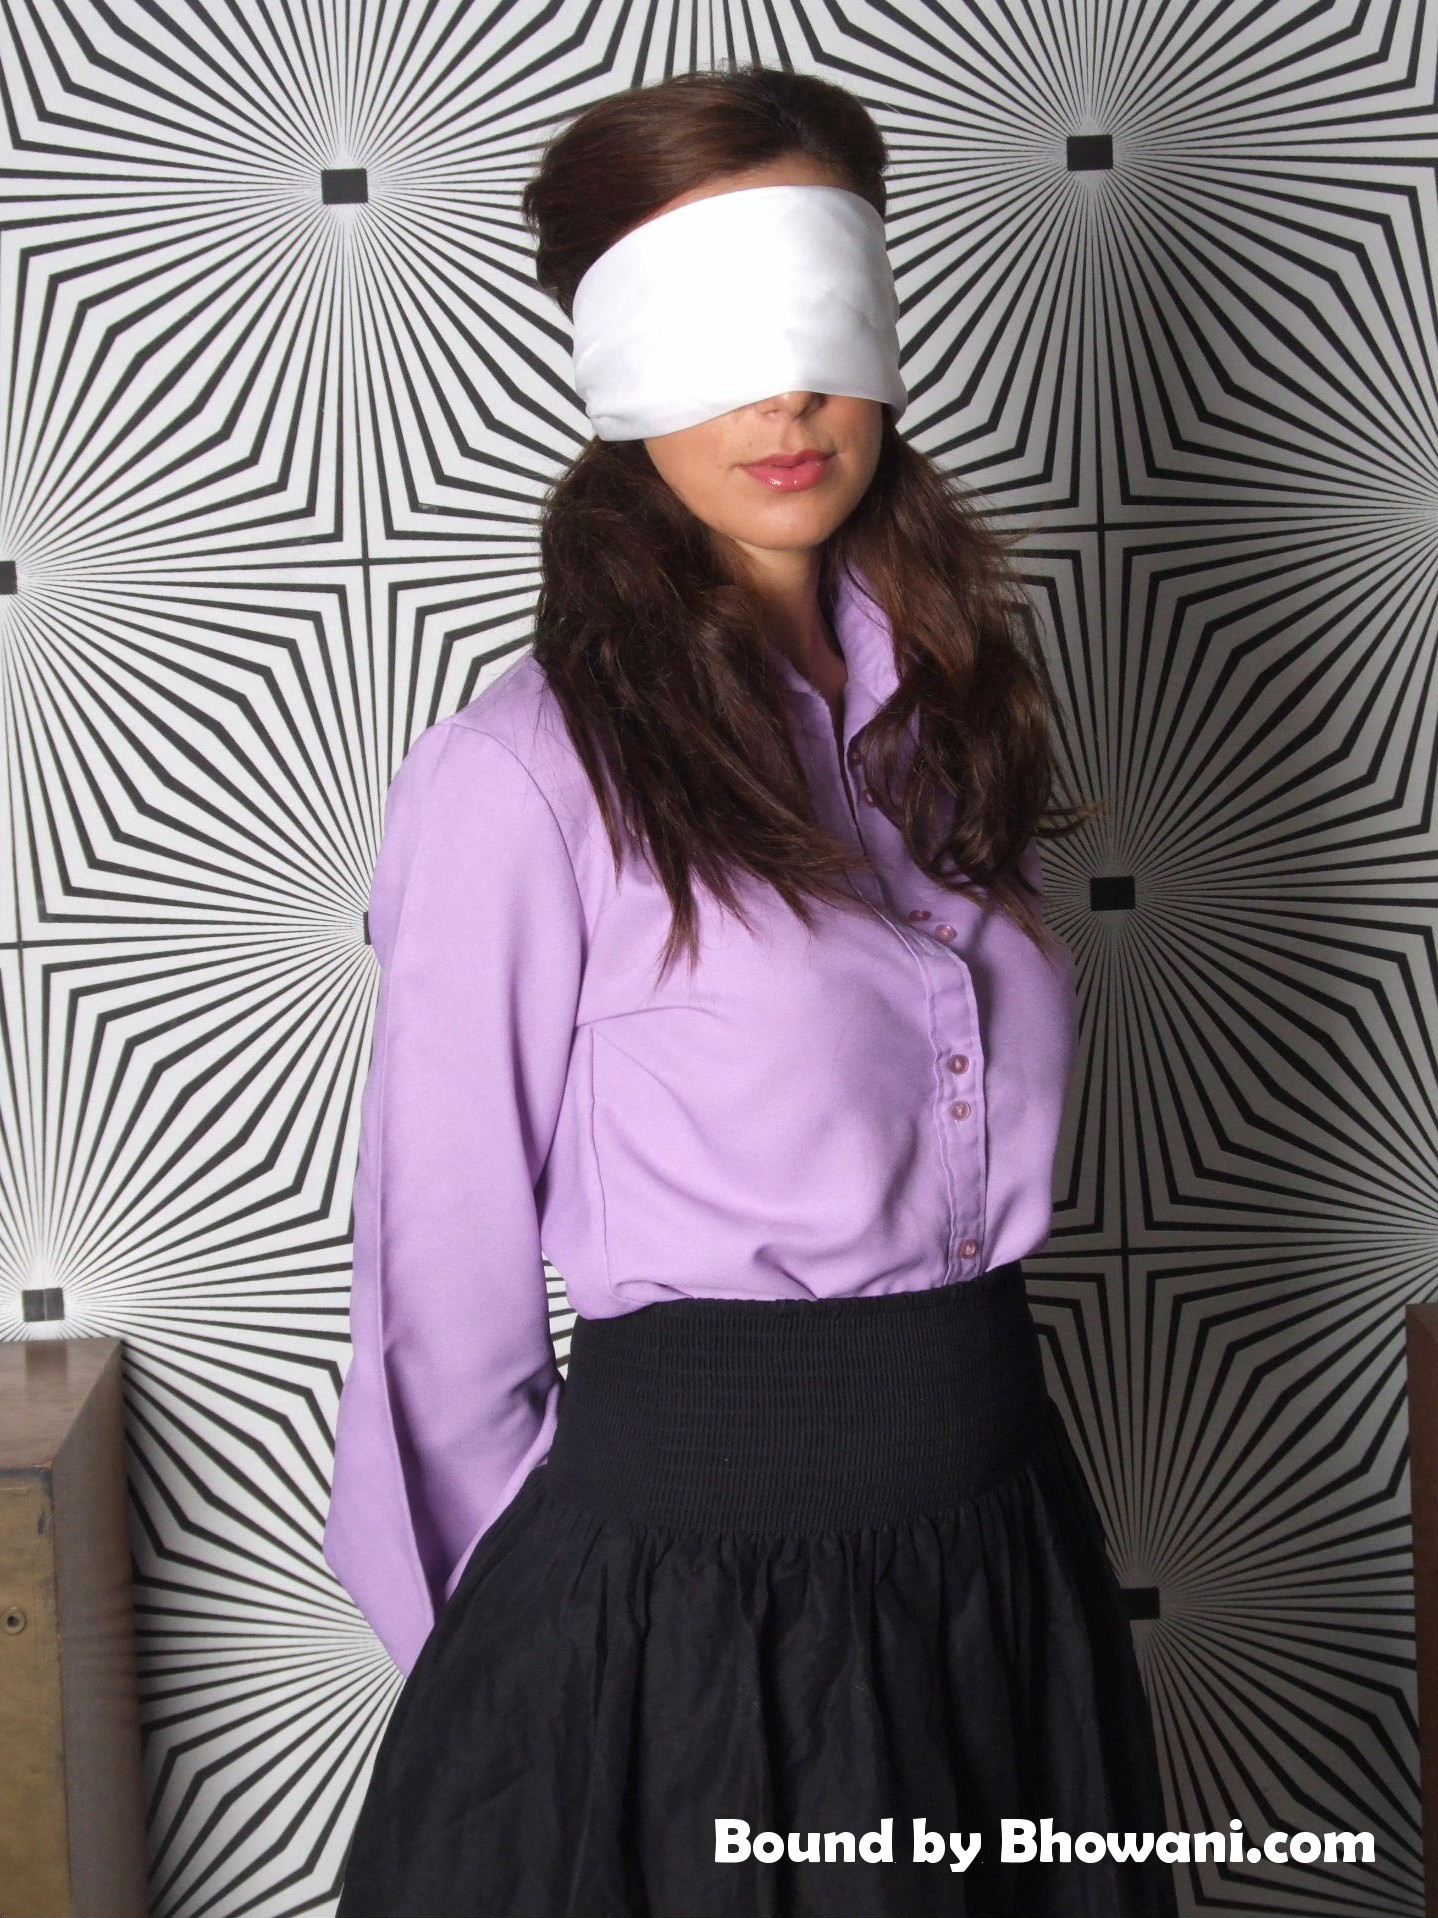 Blindfolded Chrissy